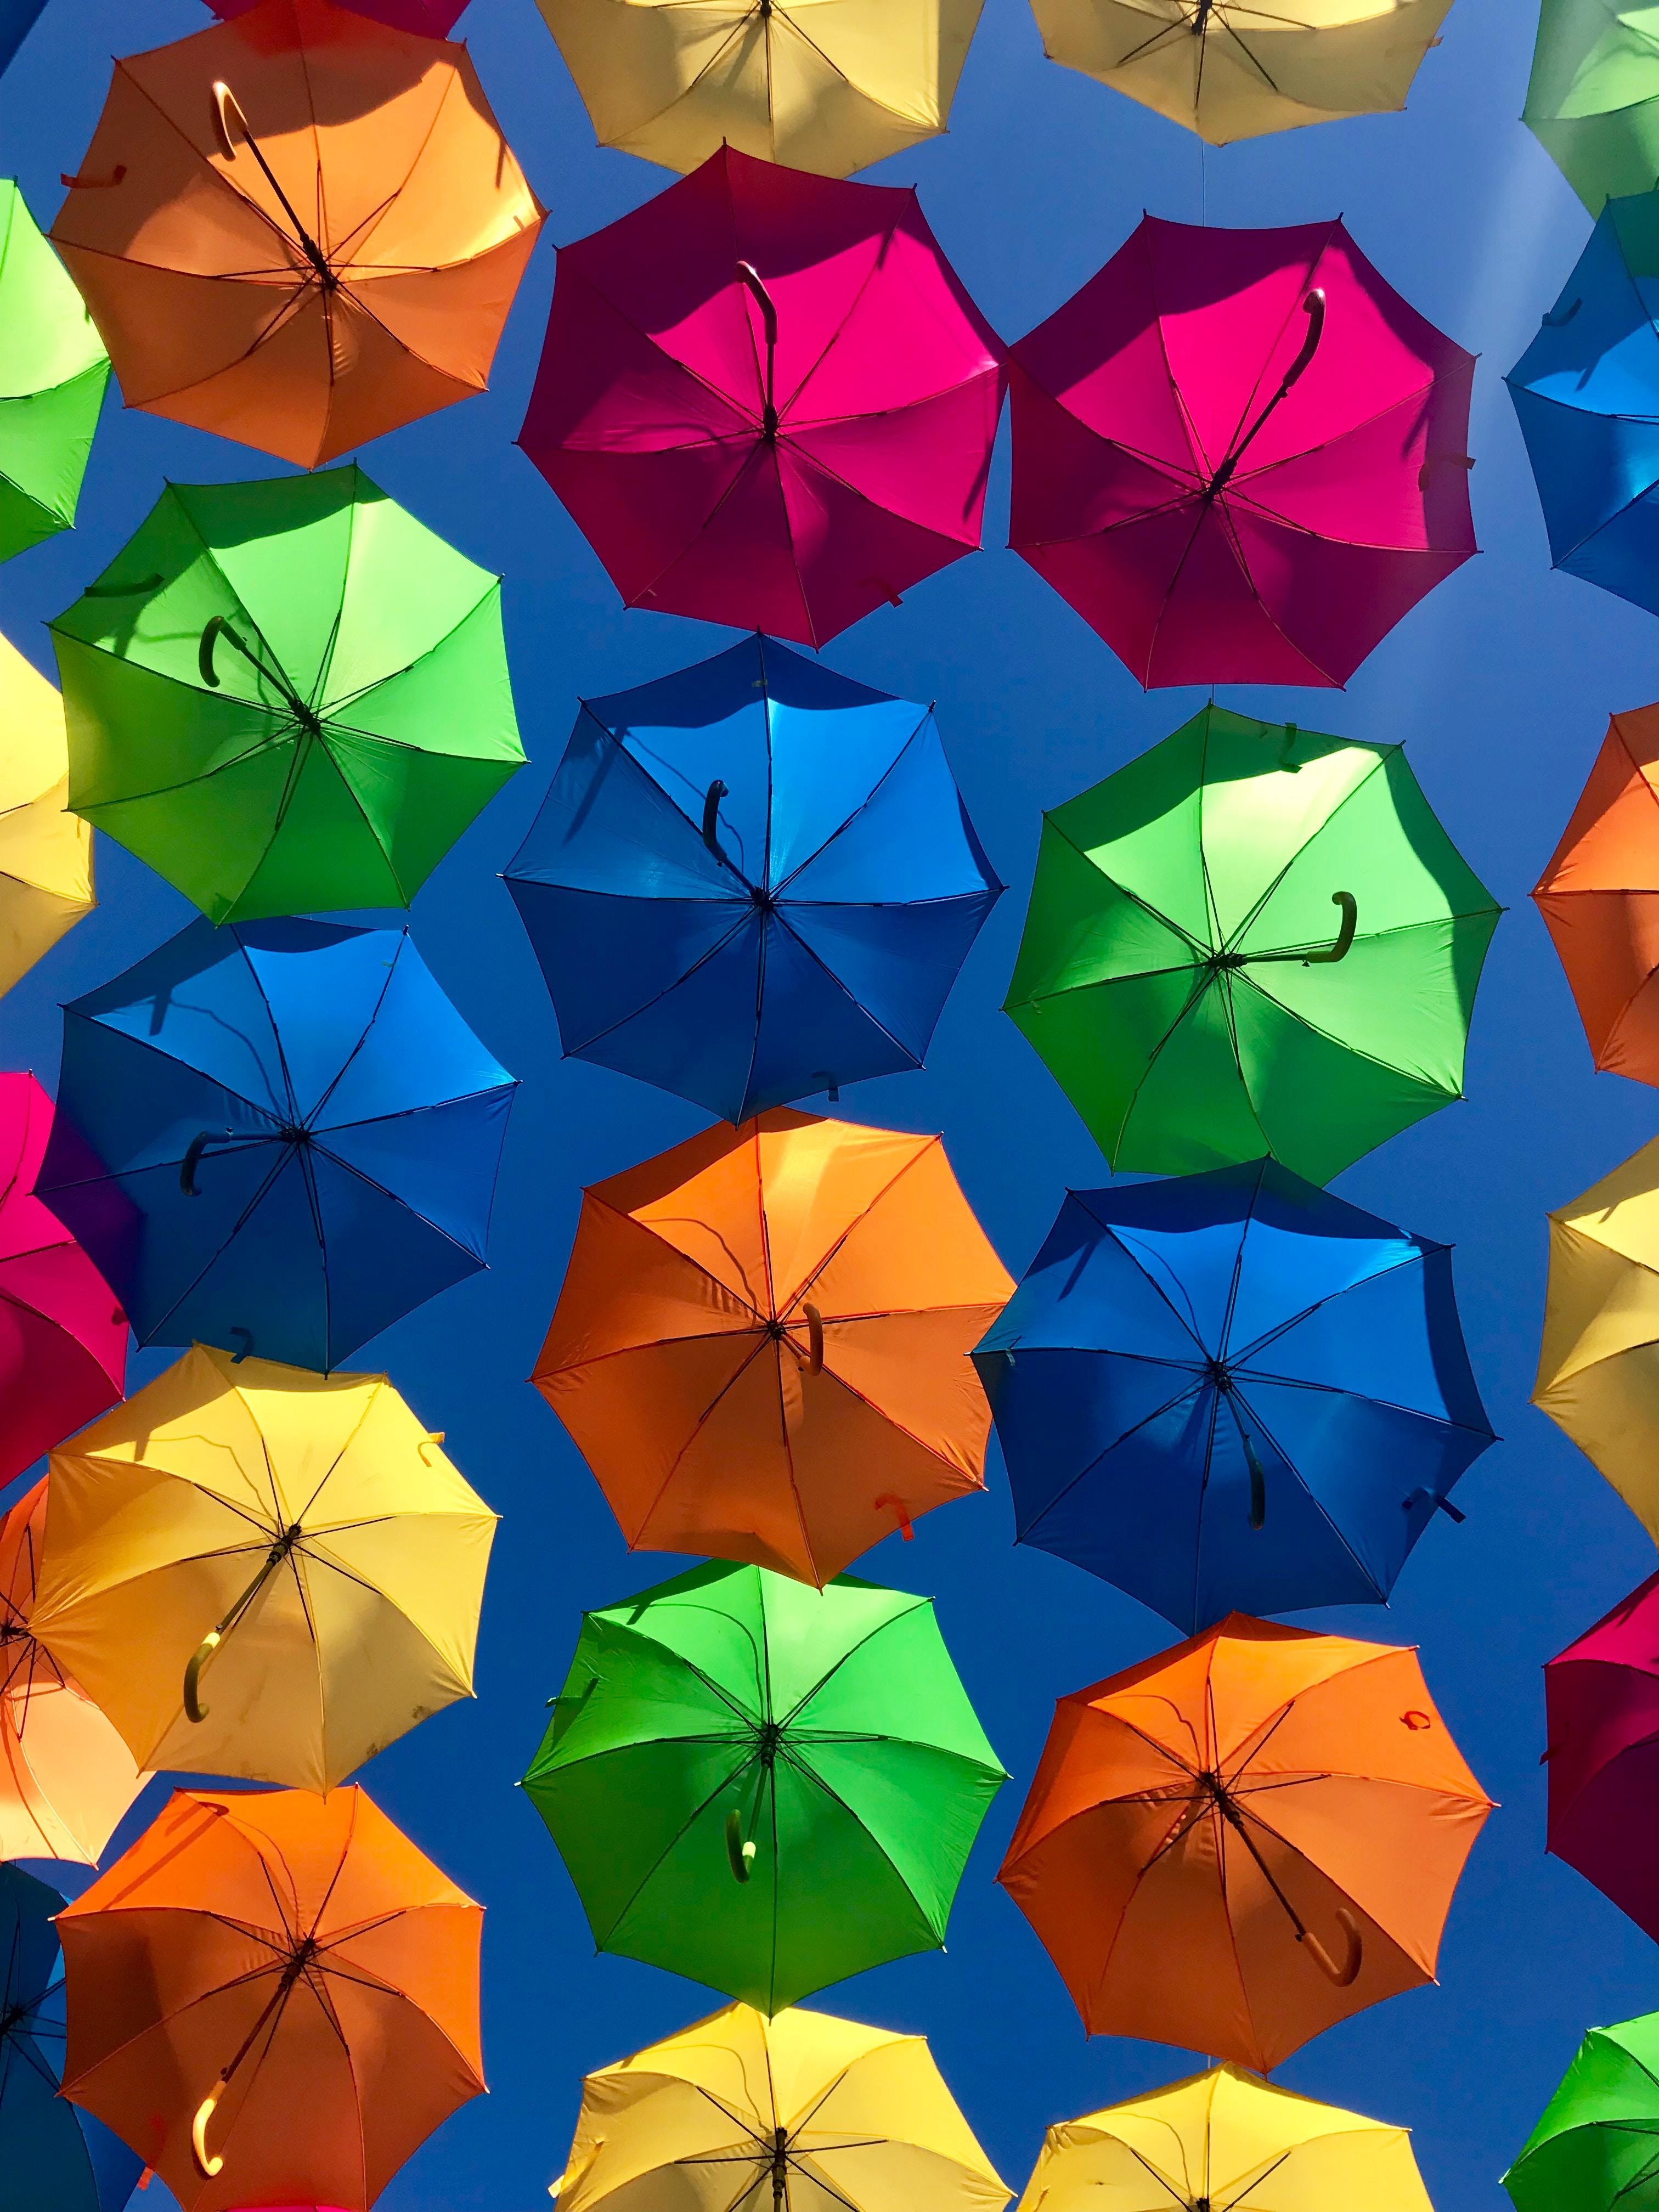 145878 download wallpaper Multicolored, Sky, Miscellanea, Miscellaneous, Motley, Sunny, Umbrellas screensavers and pictures for free